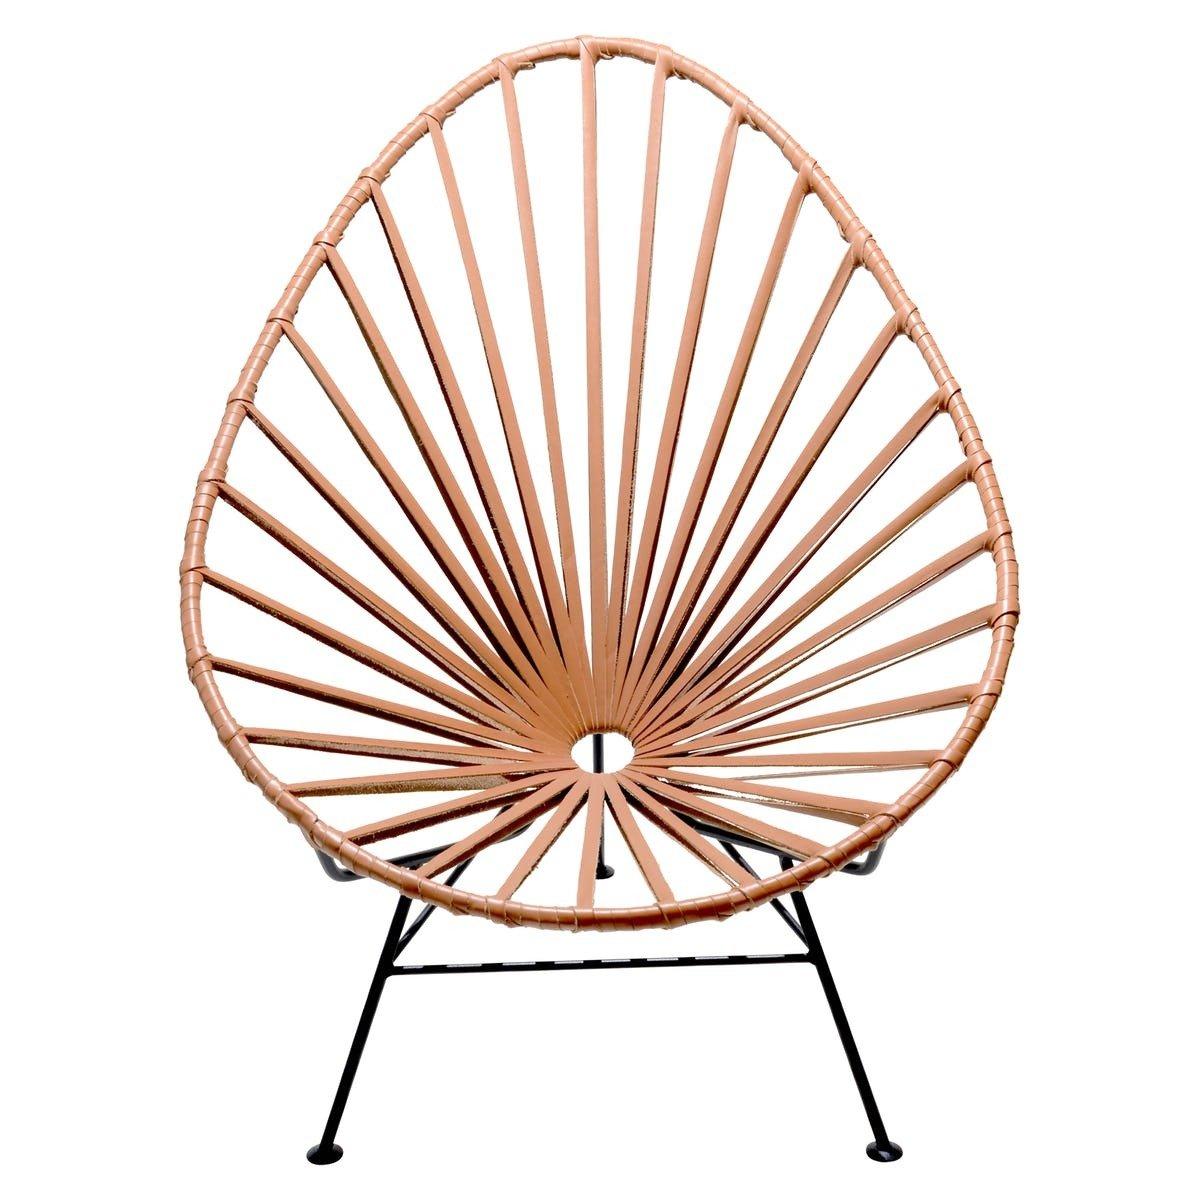 Mexa Acapulco Leather Lounge Chair